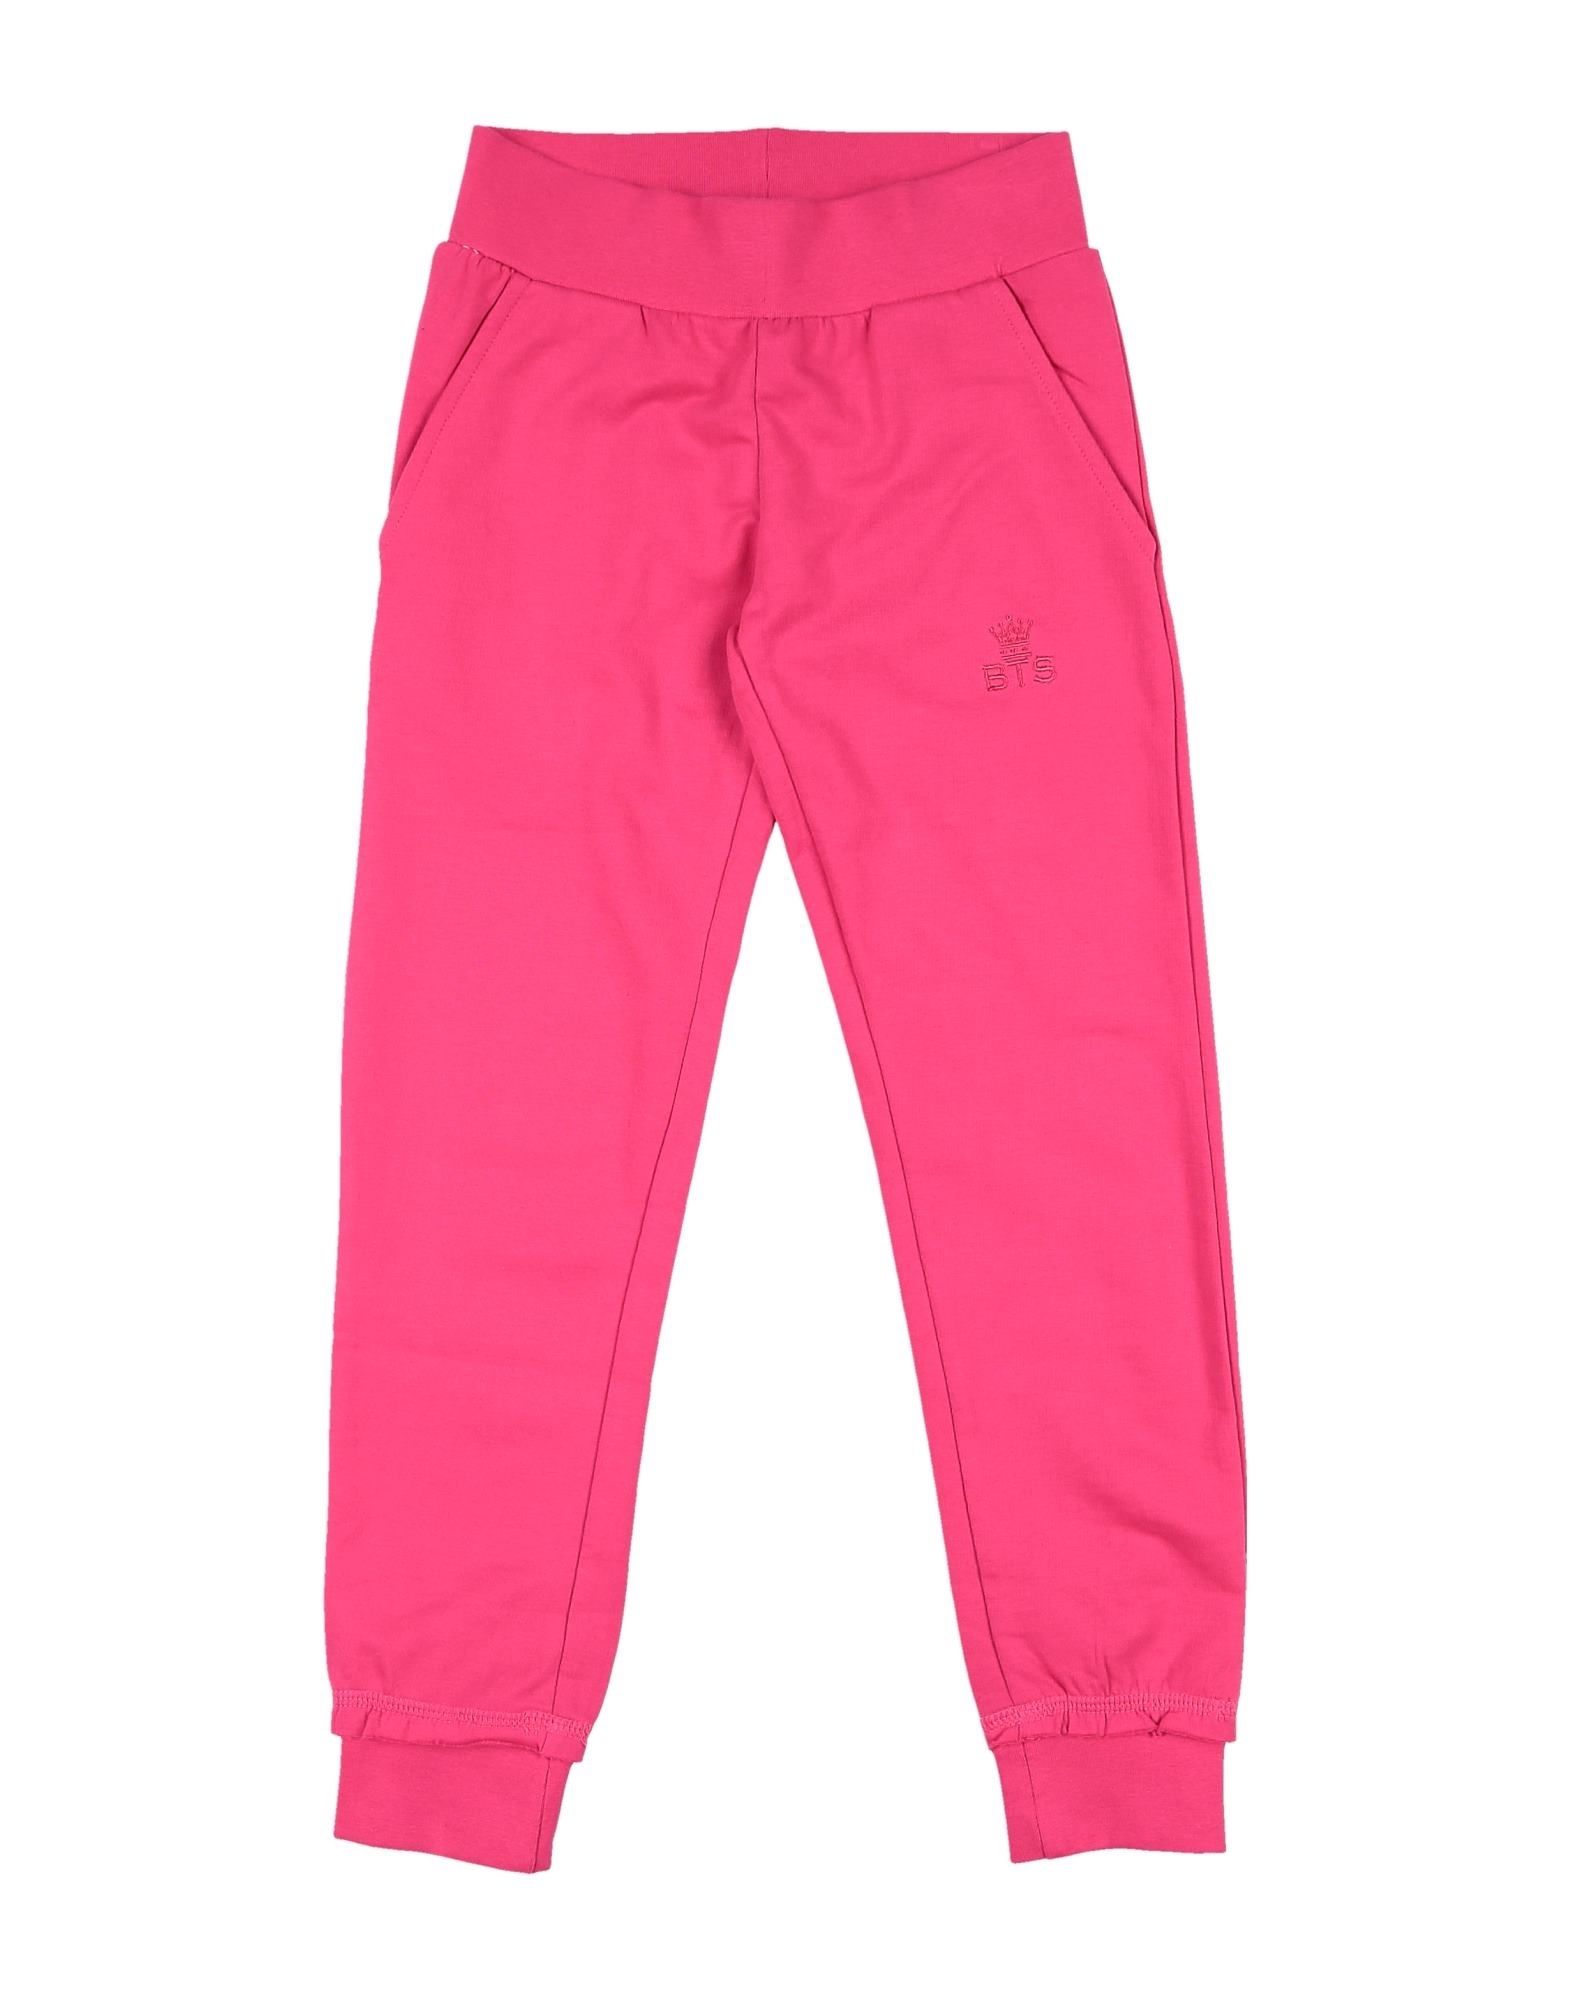 Bts Kids' Casual Pants In Neutrals